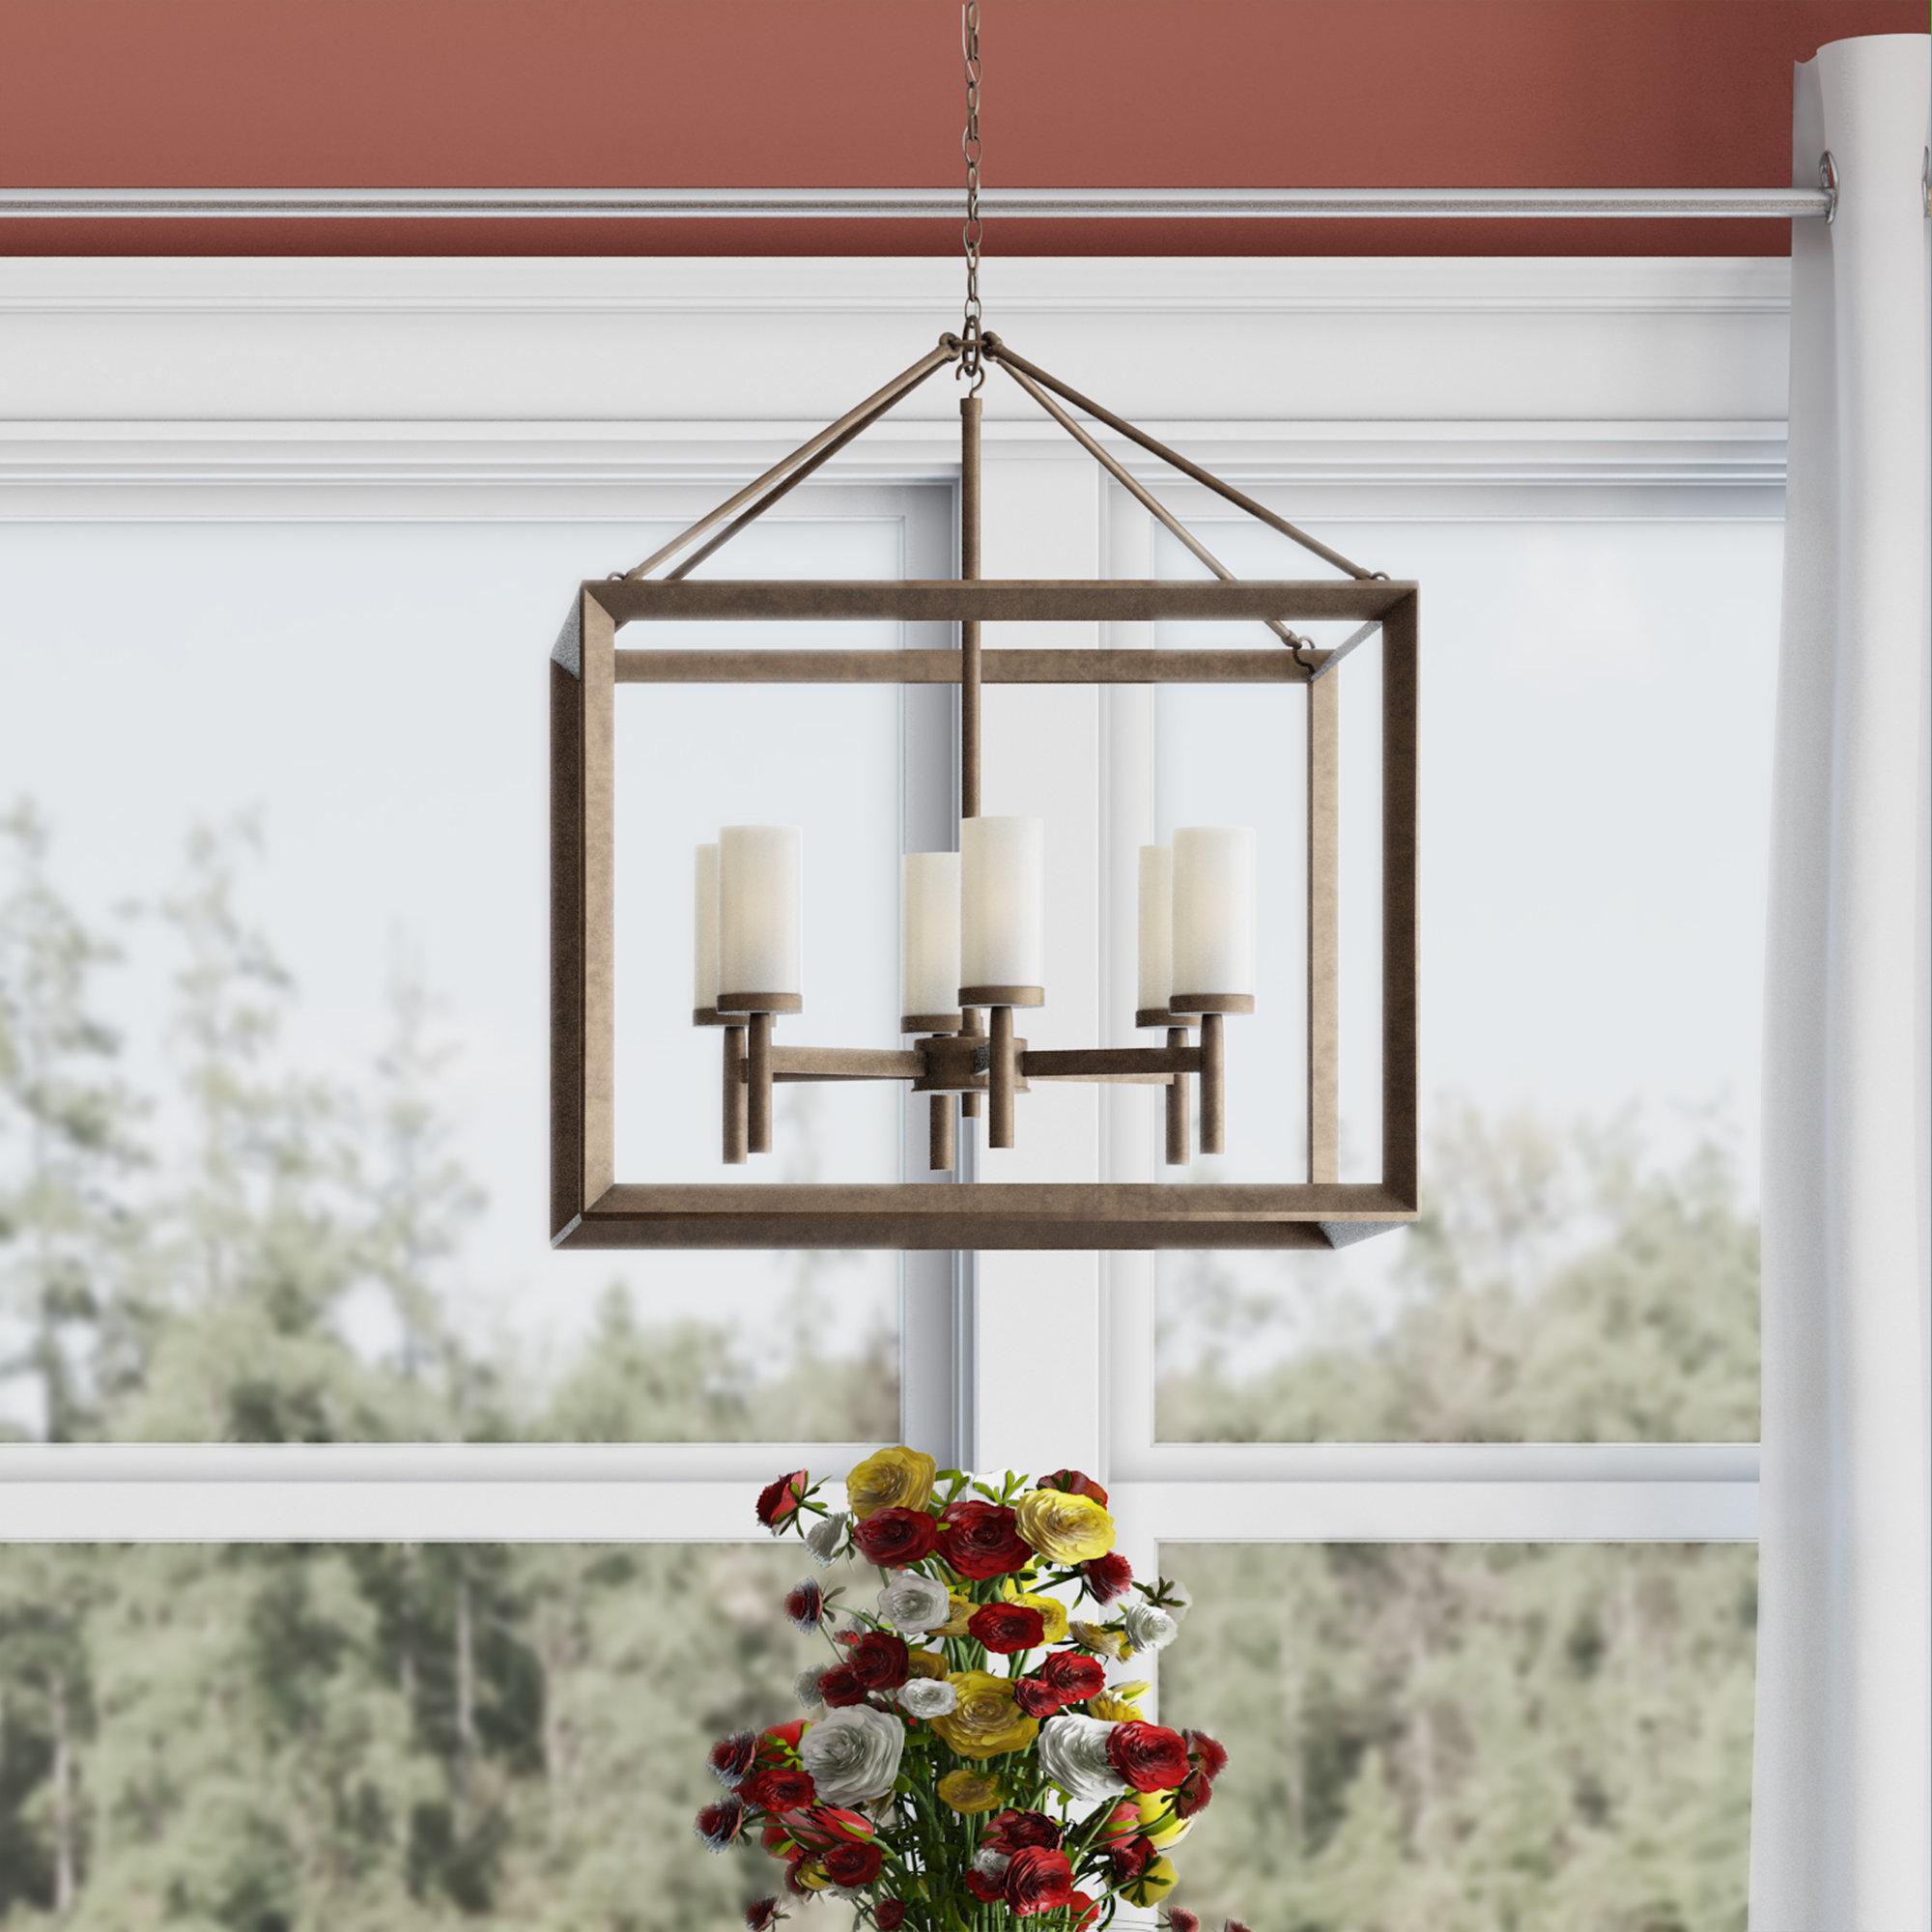 Thorne 6 Light Lantern Square / Rectangle Pendant Inside Most Up To Date Odie 8 Light Lantern Square / Rectangle Pendants (View 17 of 20)